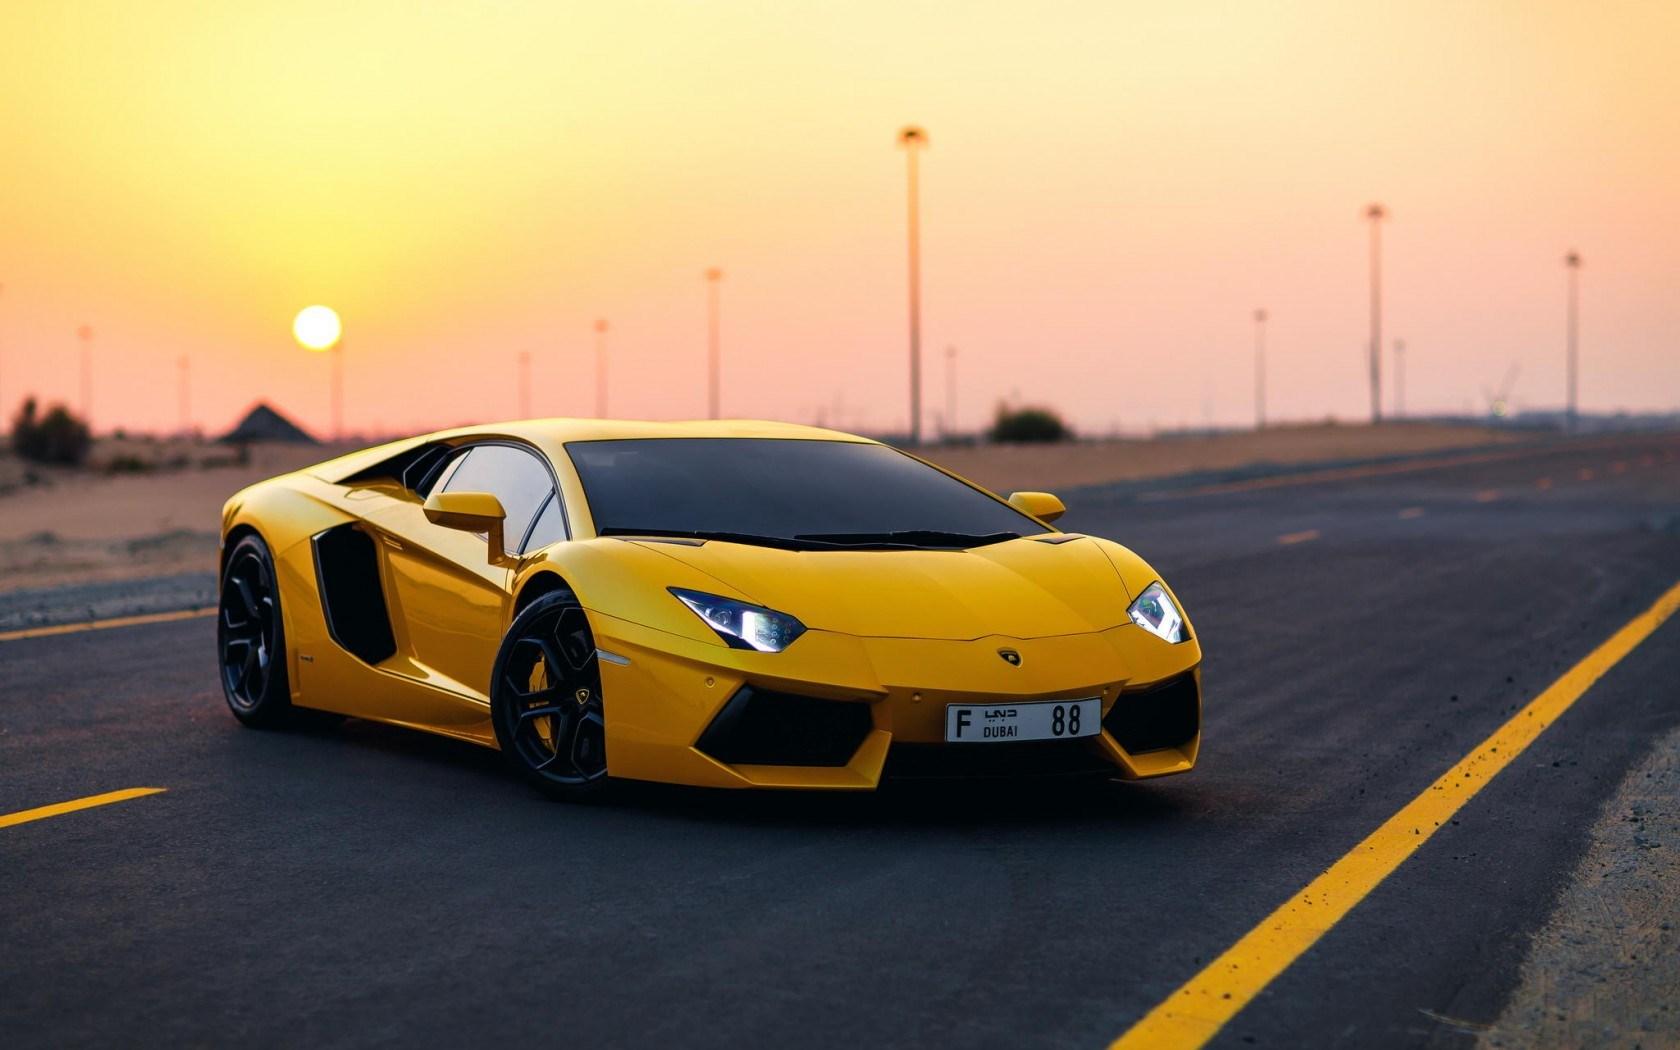 Yellow Lamborghini Wallpaper 35093 1680x1050px 1680x1050